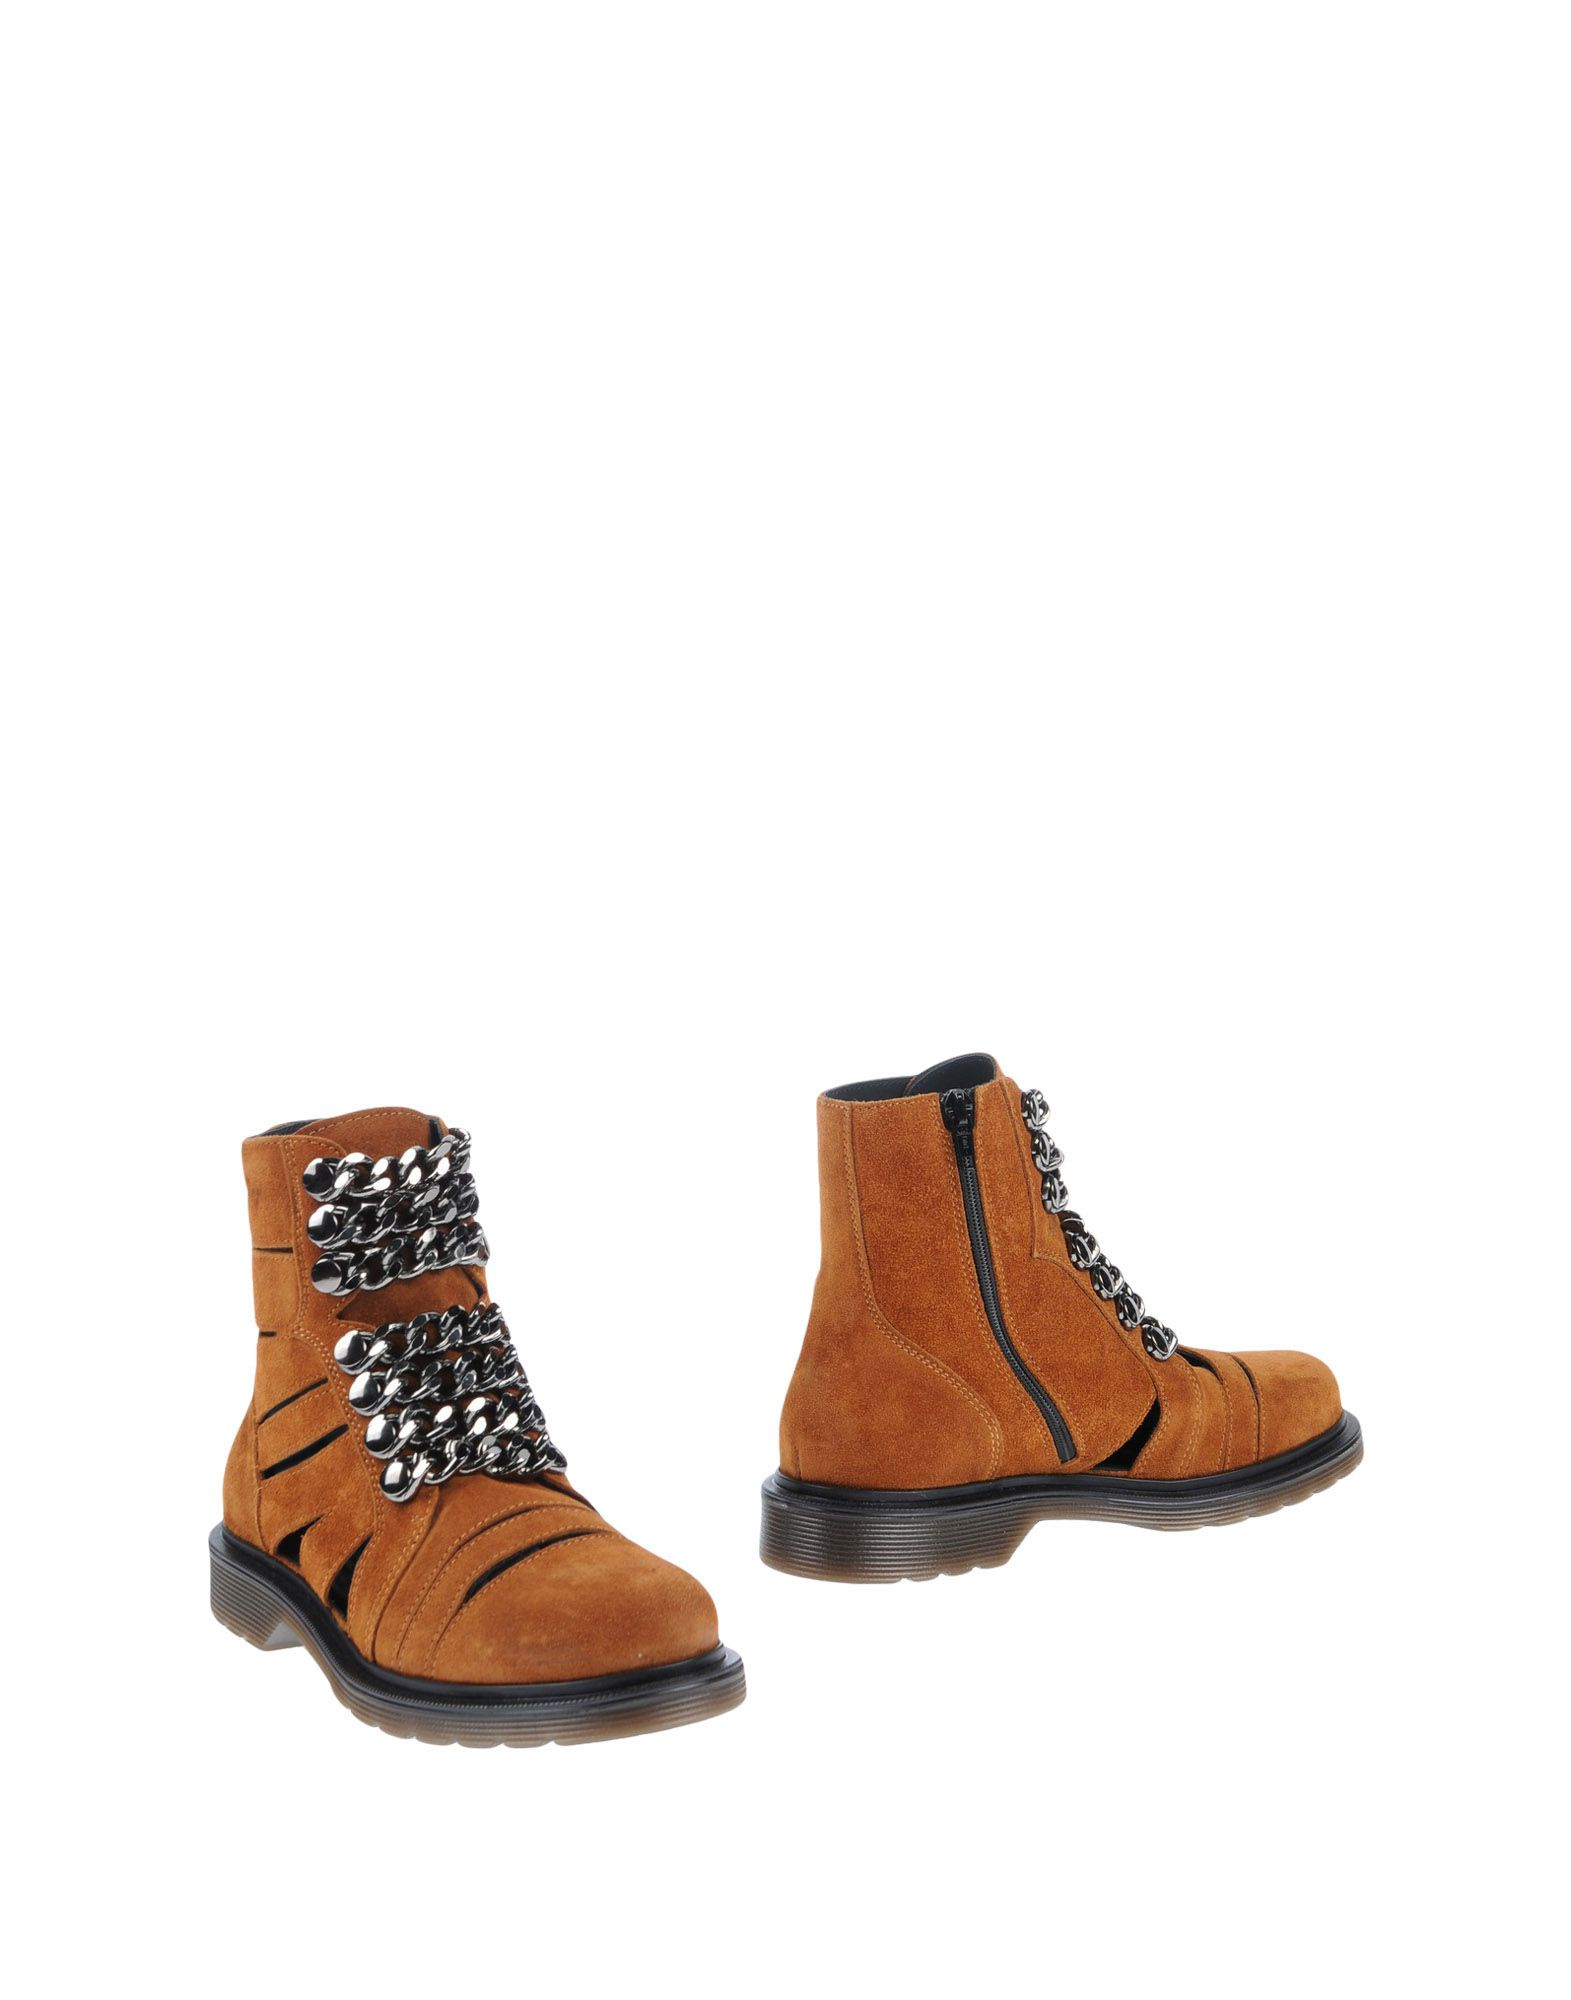 Le Dangerouge Stiefelette strapazierfähige Damen  11506264GGGut aussehende strapazierfähige Stiefelette Schuhe 6267ac